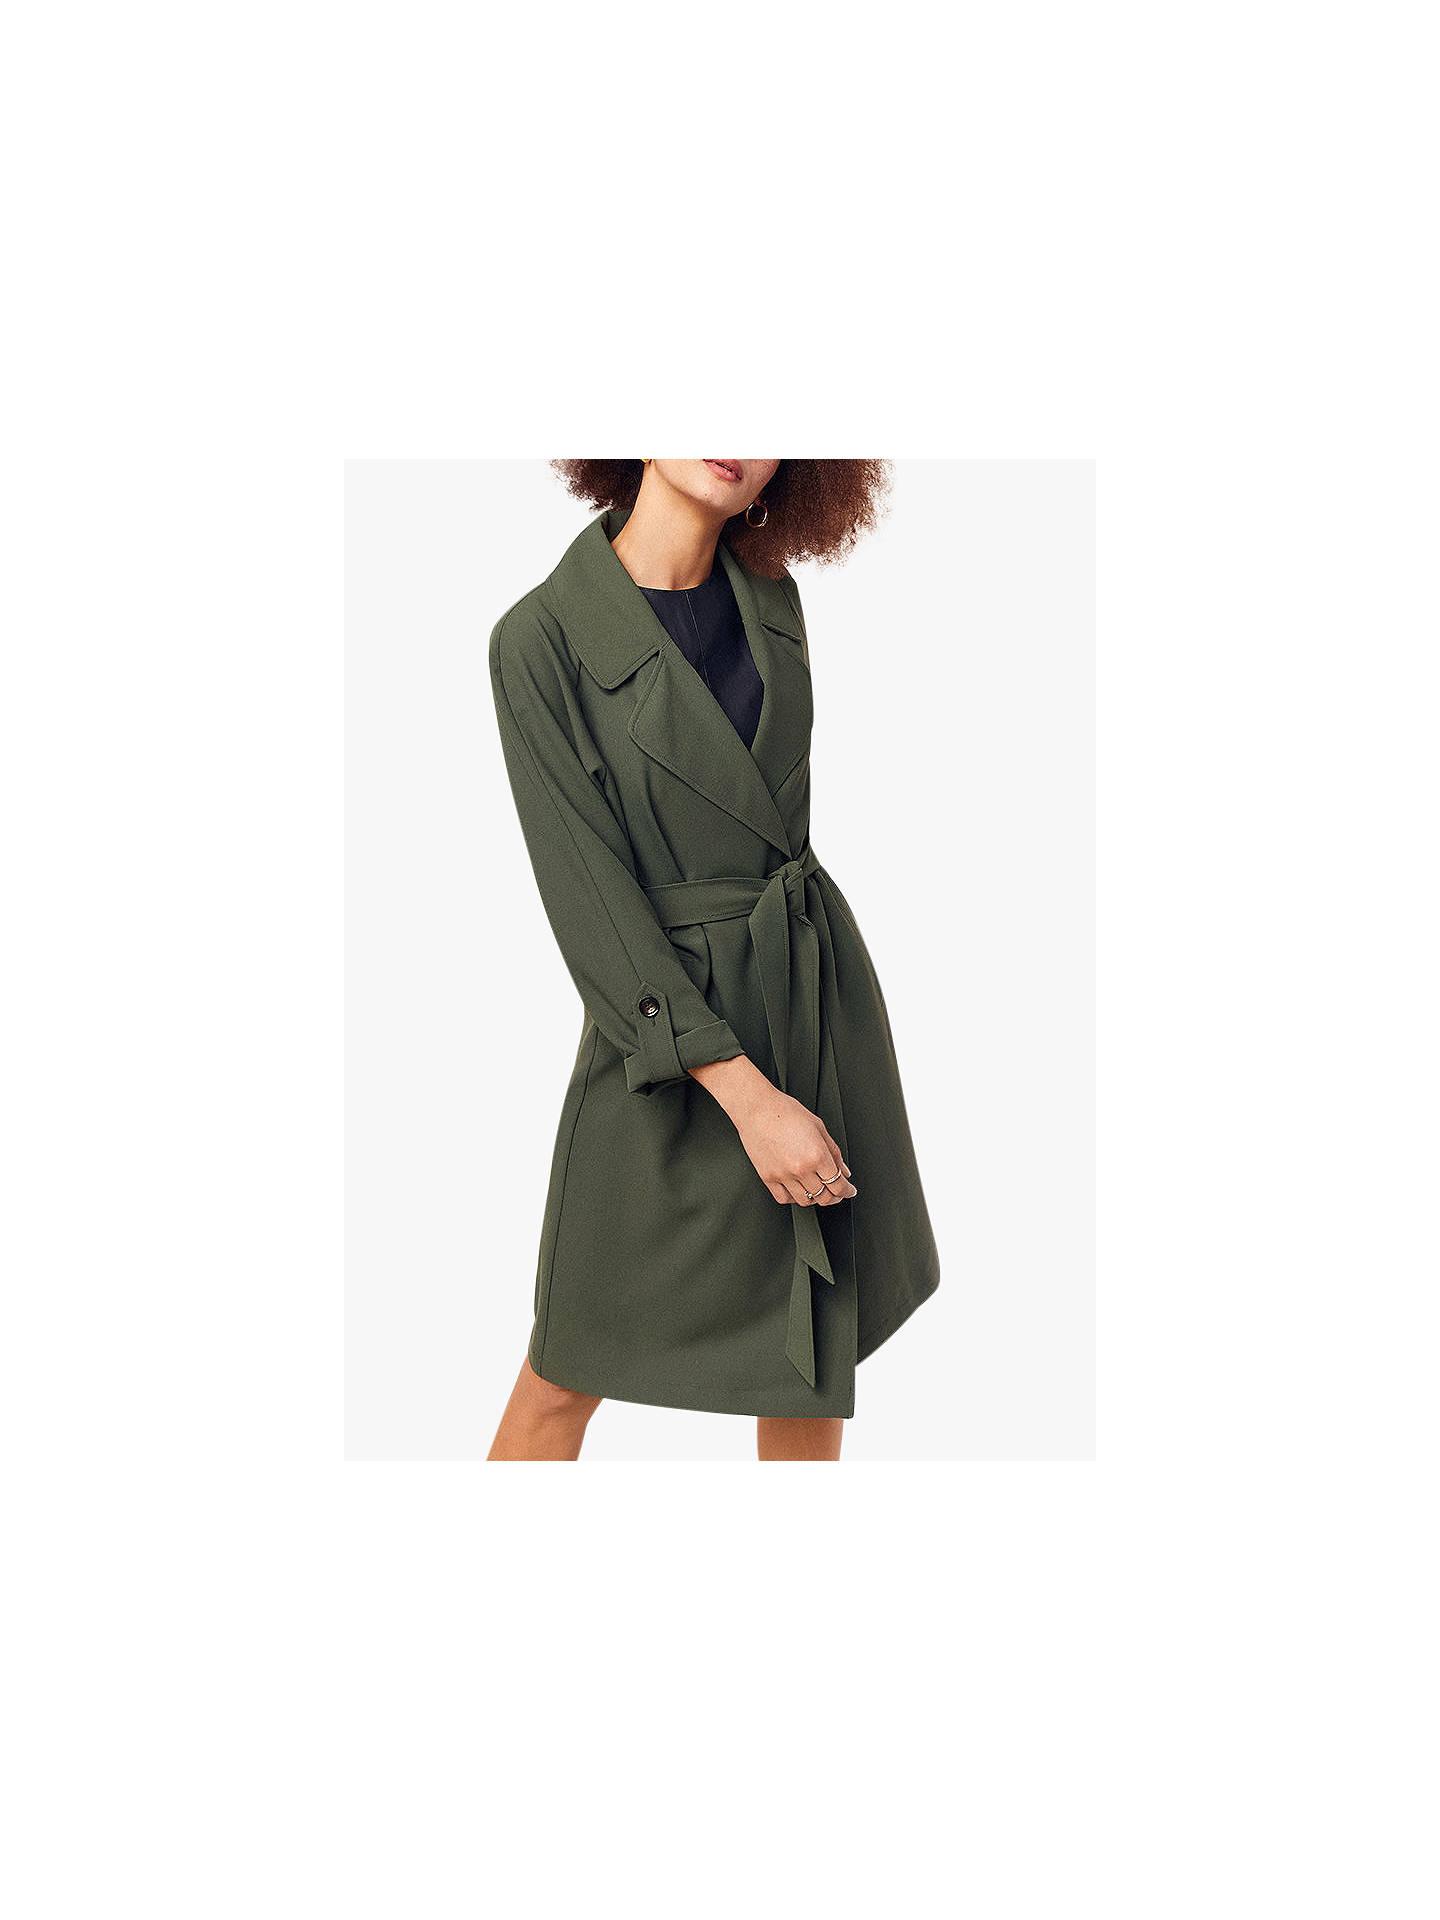 Oasis Duster Coat, Khaki by Oasis